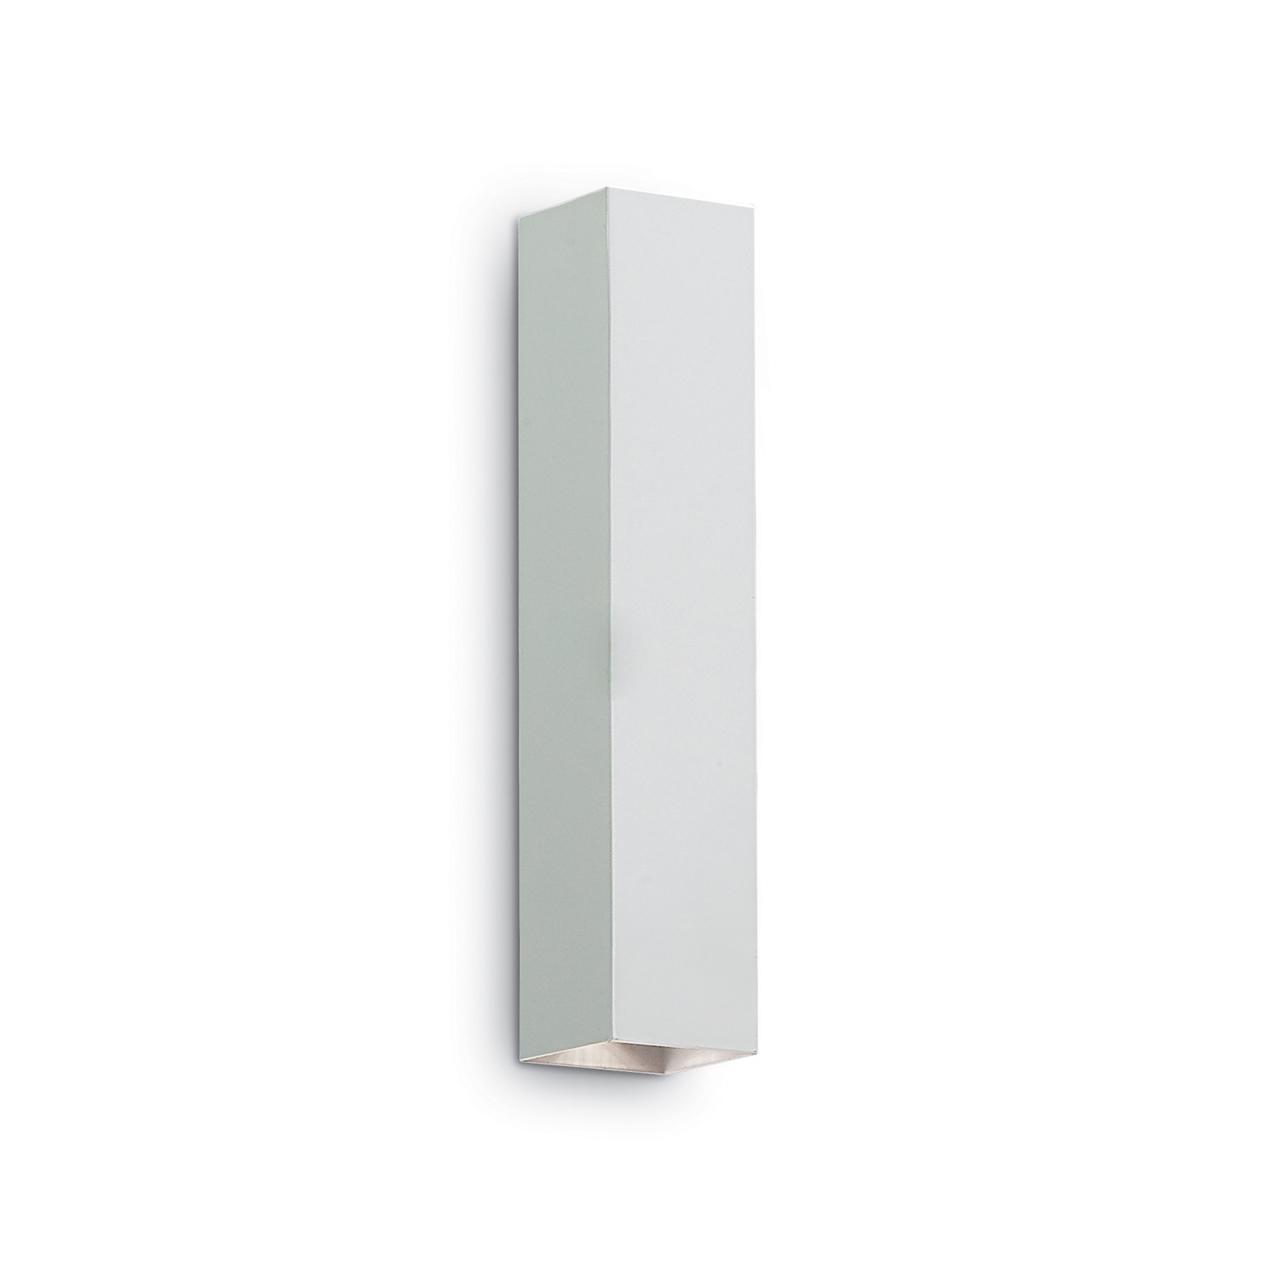 Купить Бра Ideal Lux Sky Bianco из металла, inmyroom, Италия